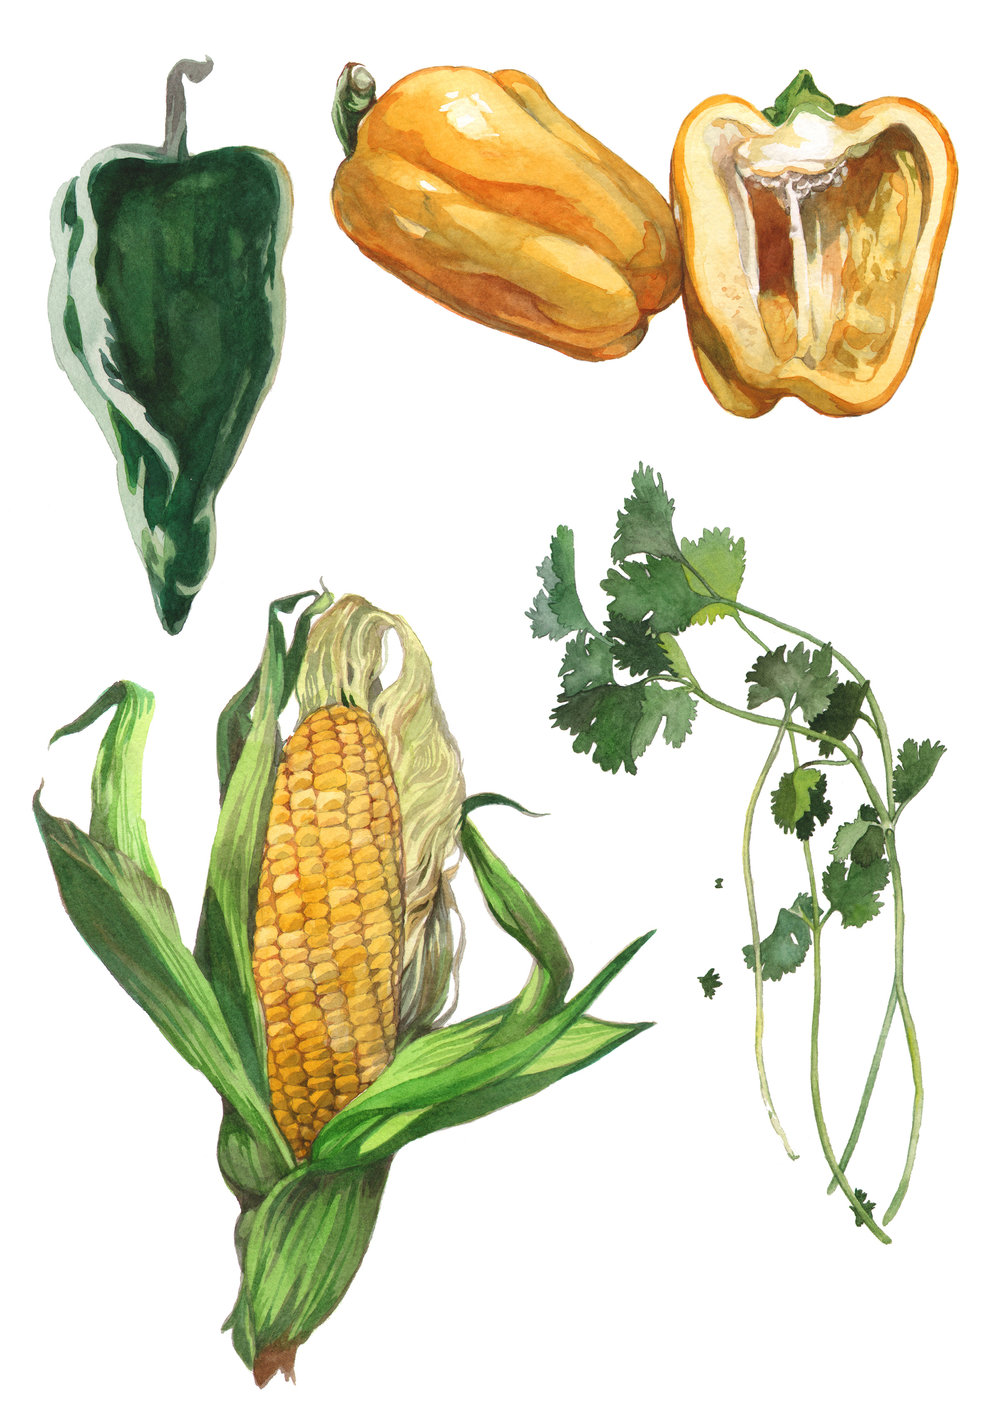 corn-peppers-cilantro.jpg